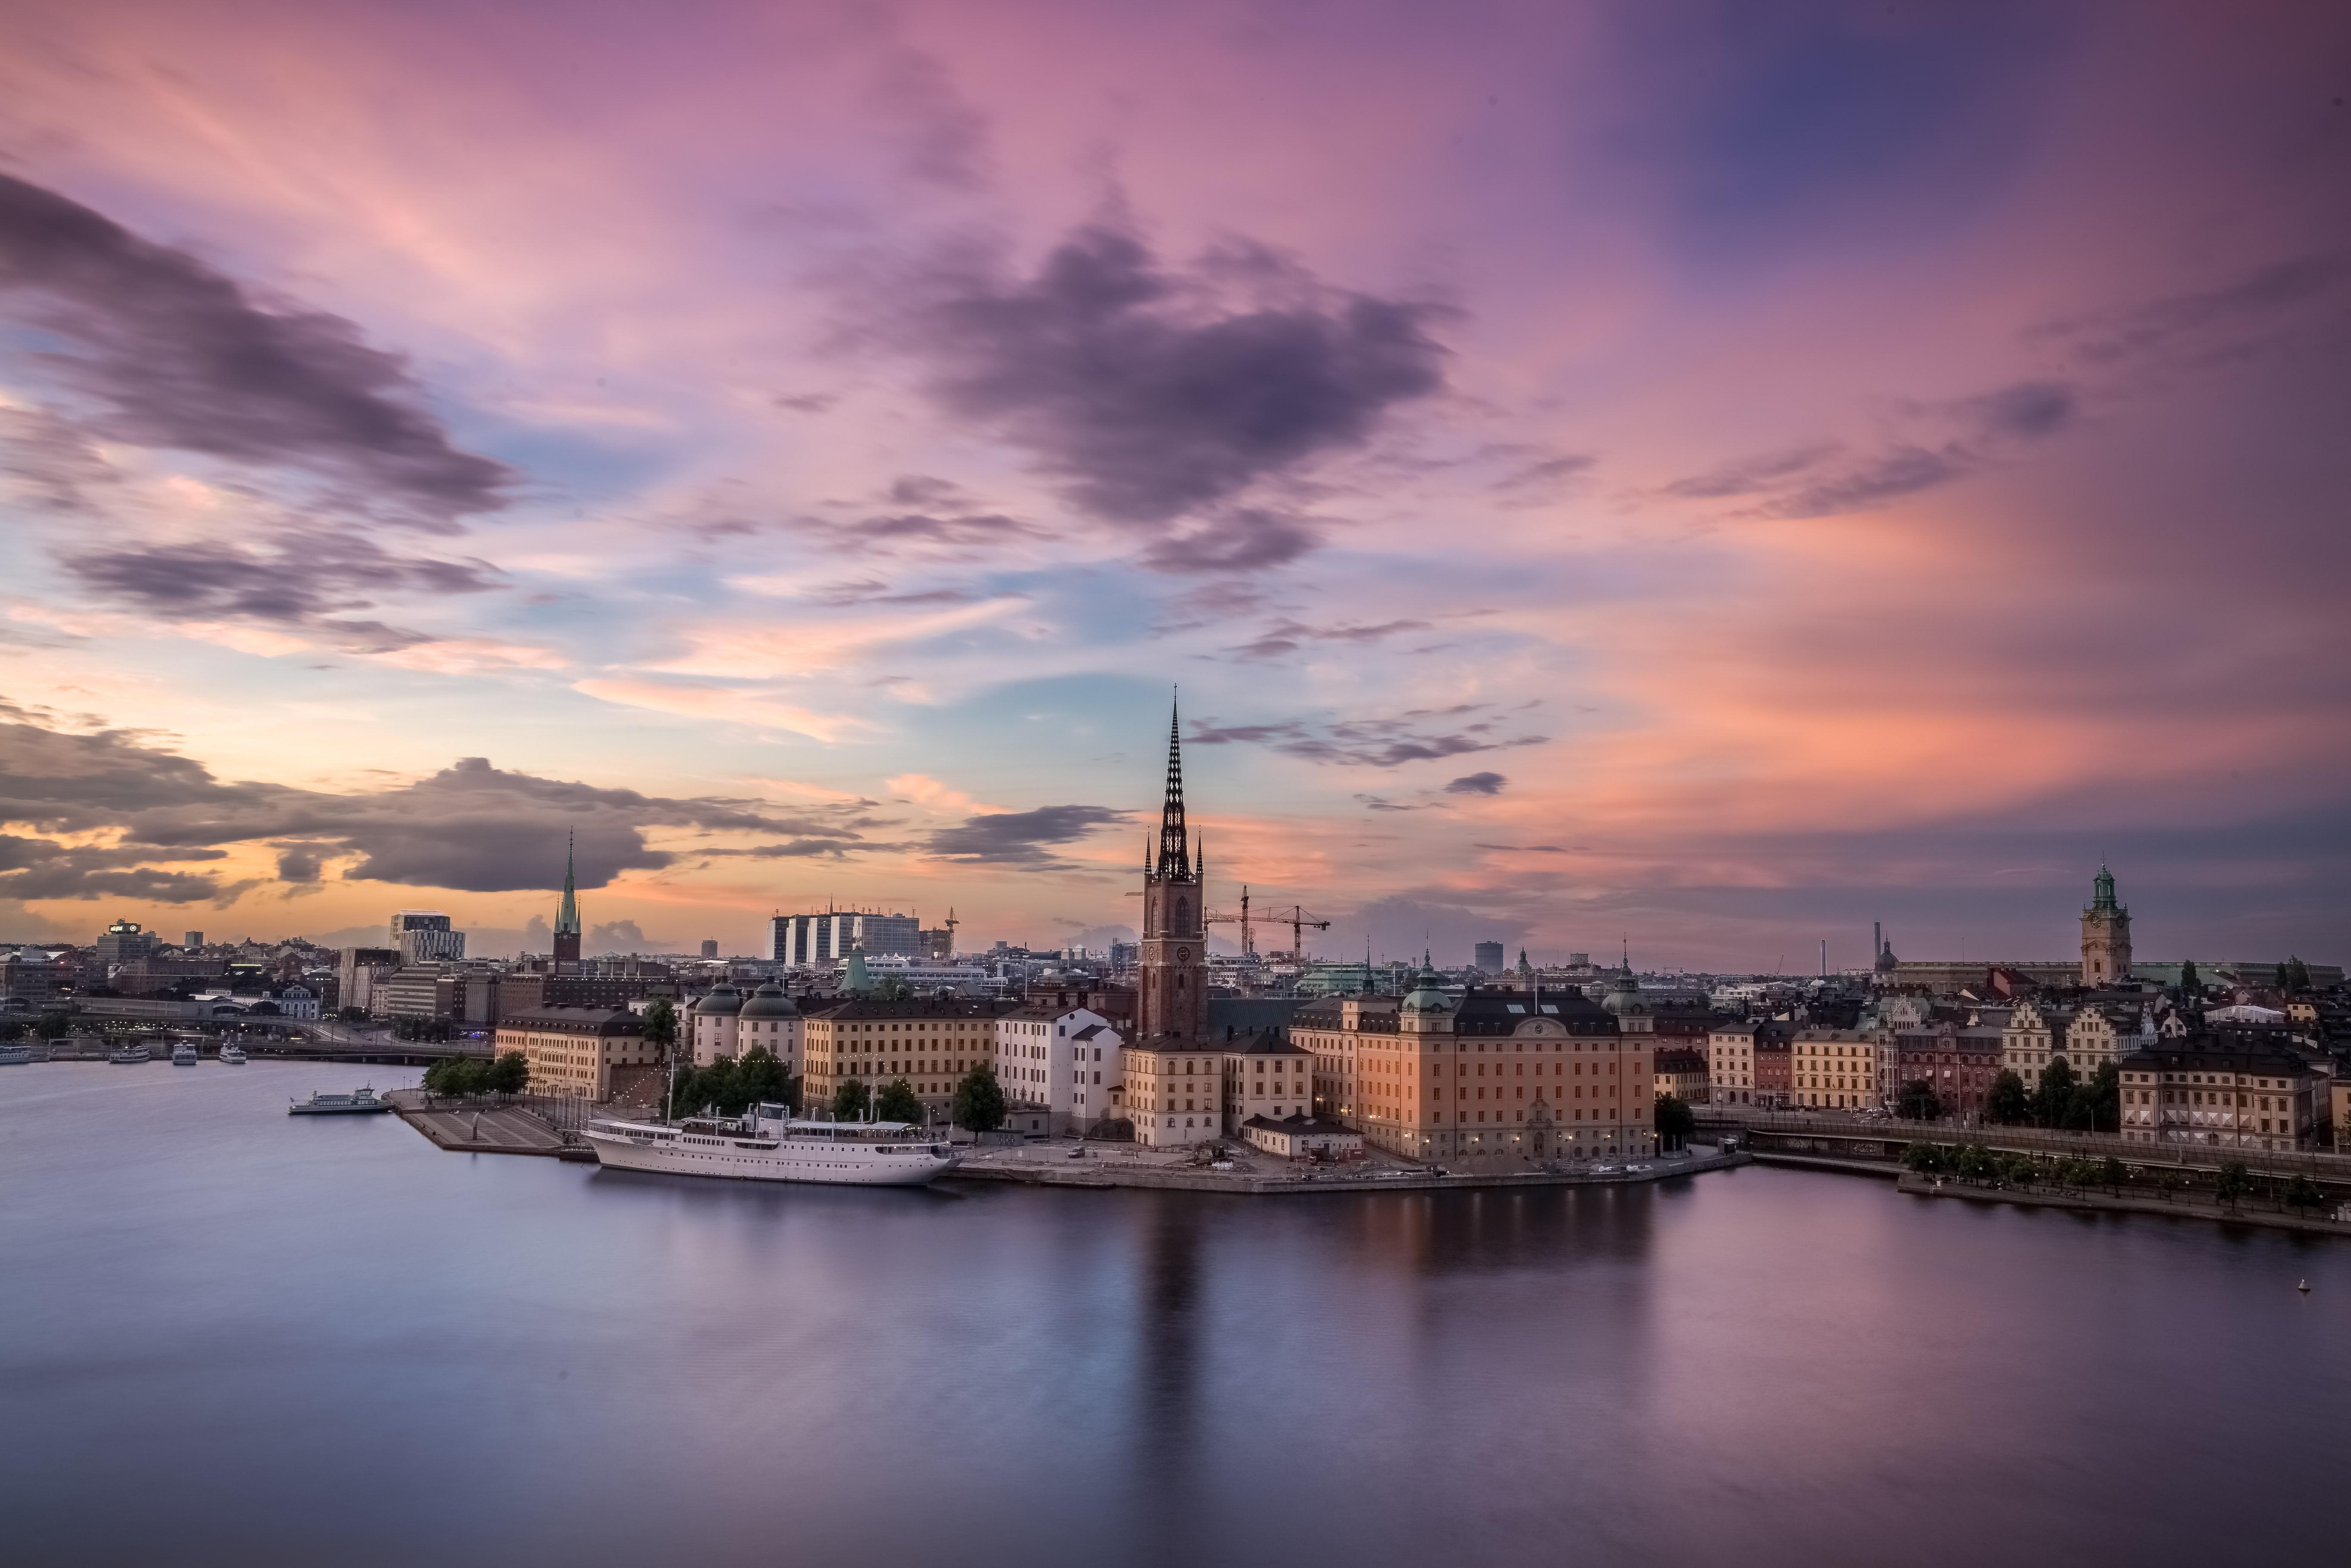 How to Apply for a Sweden Schengen Visa with your Philippine Passport